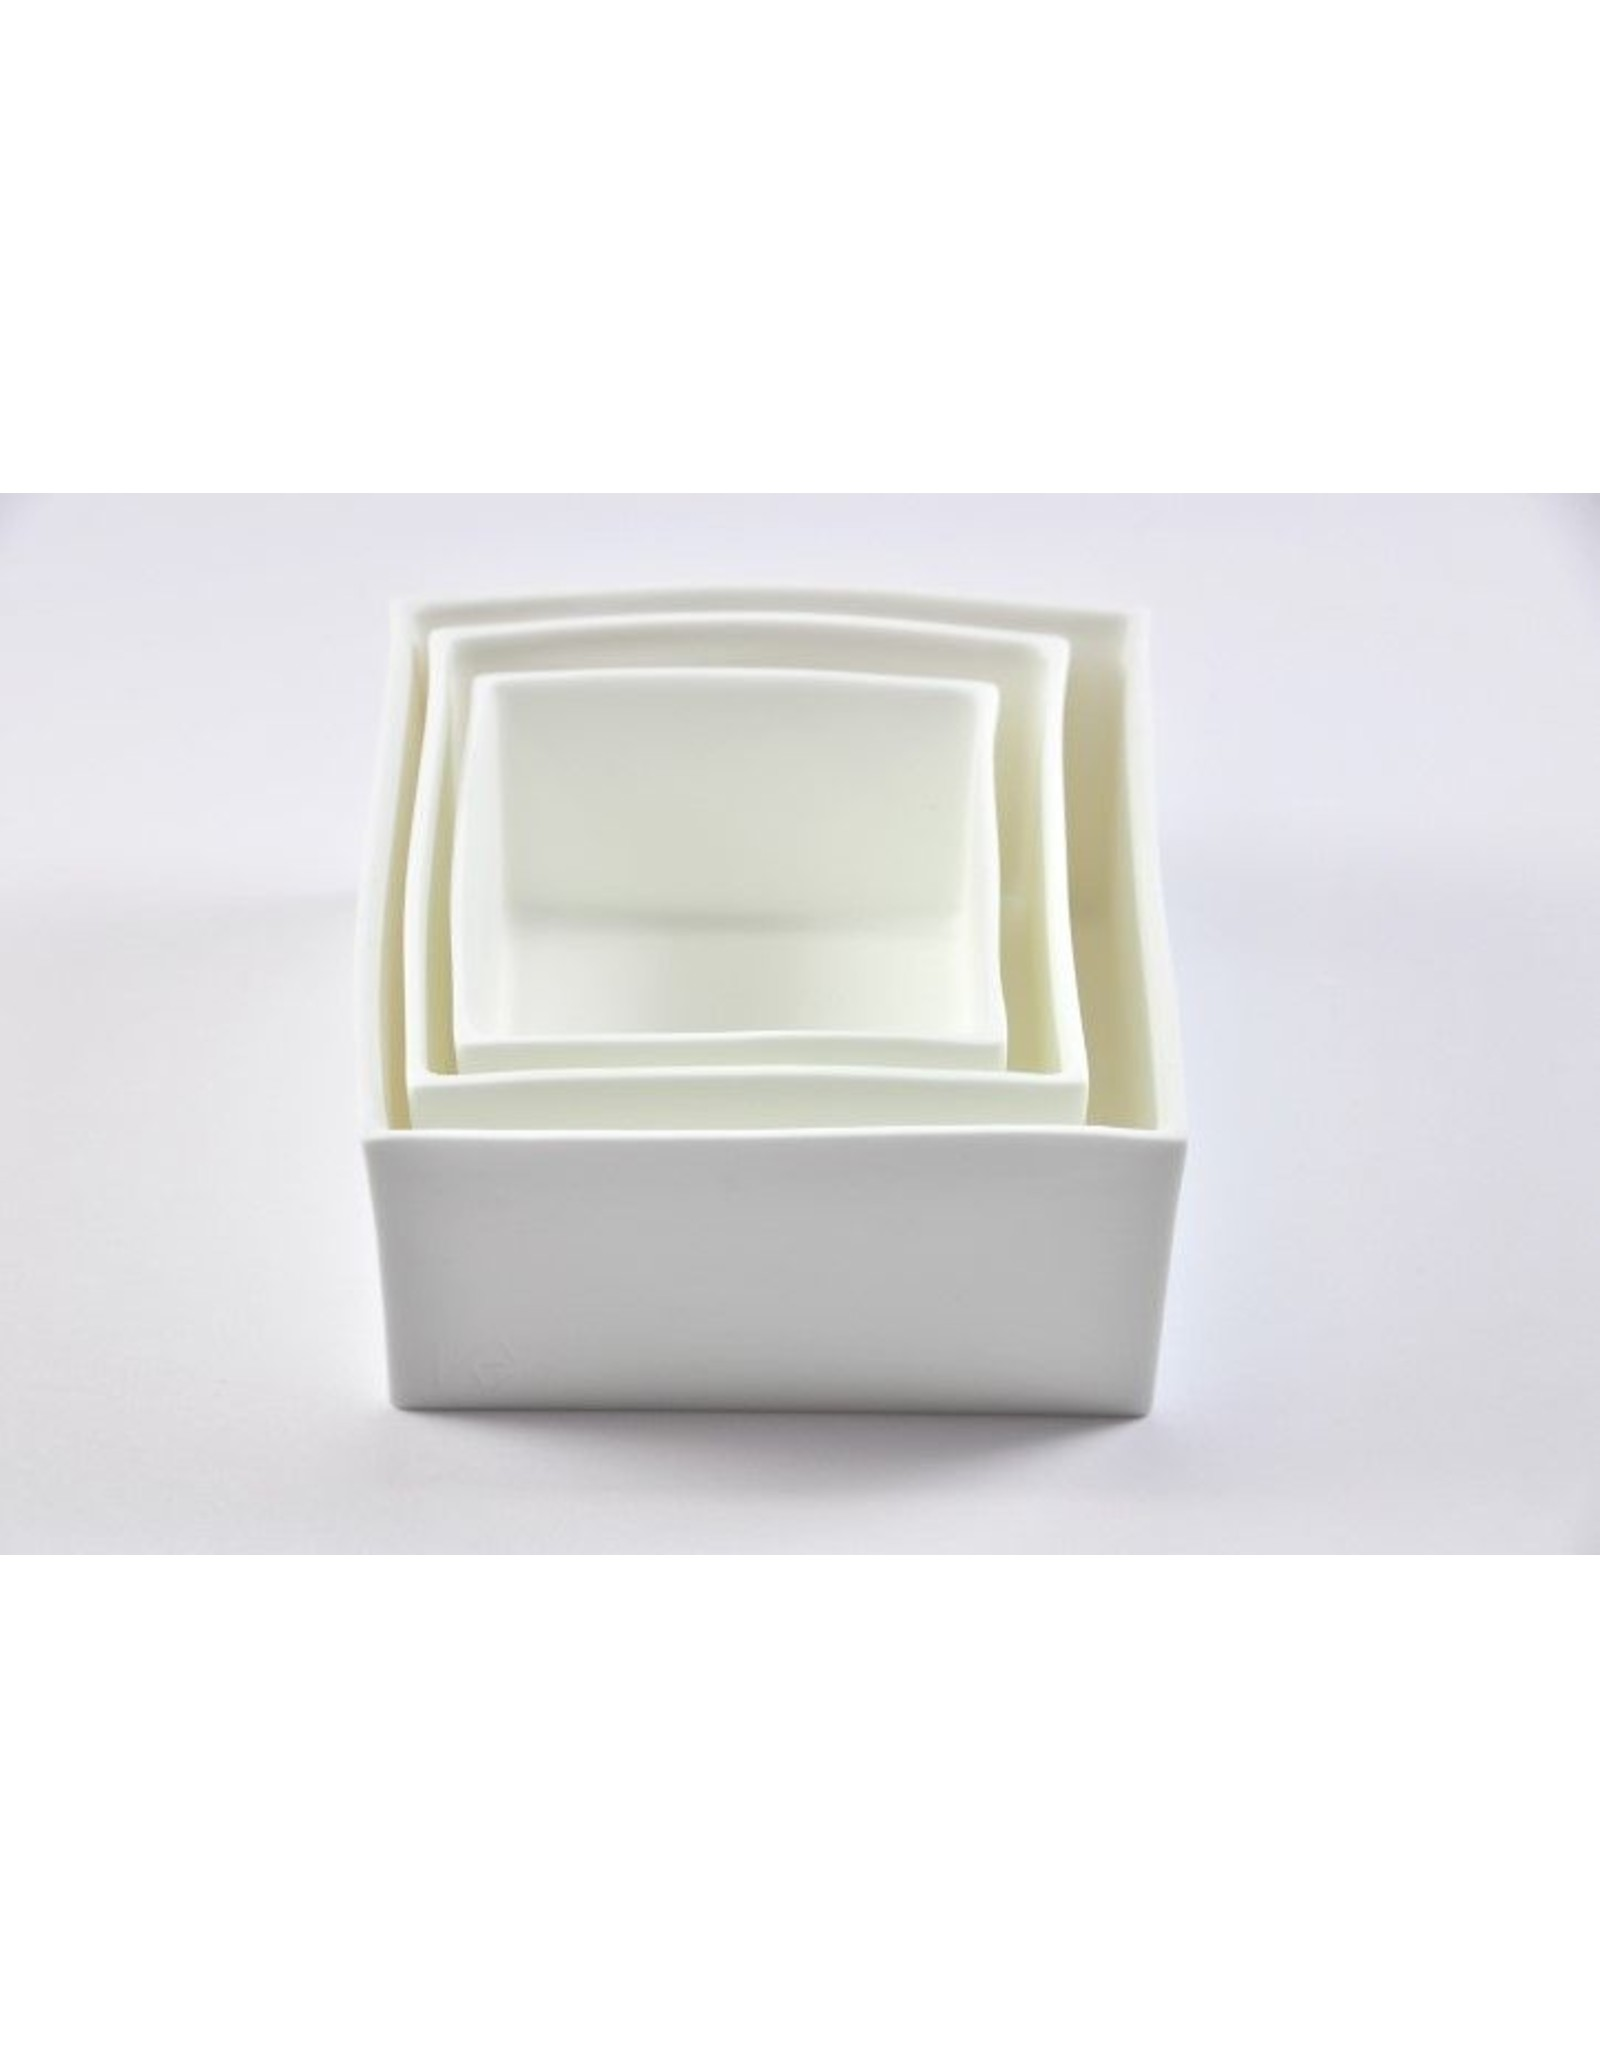 K-Design! Aperitief schalen set 3 in 1 China in Box